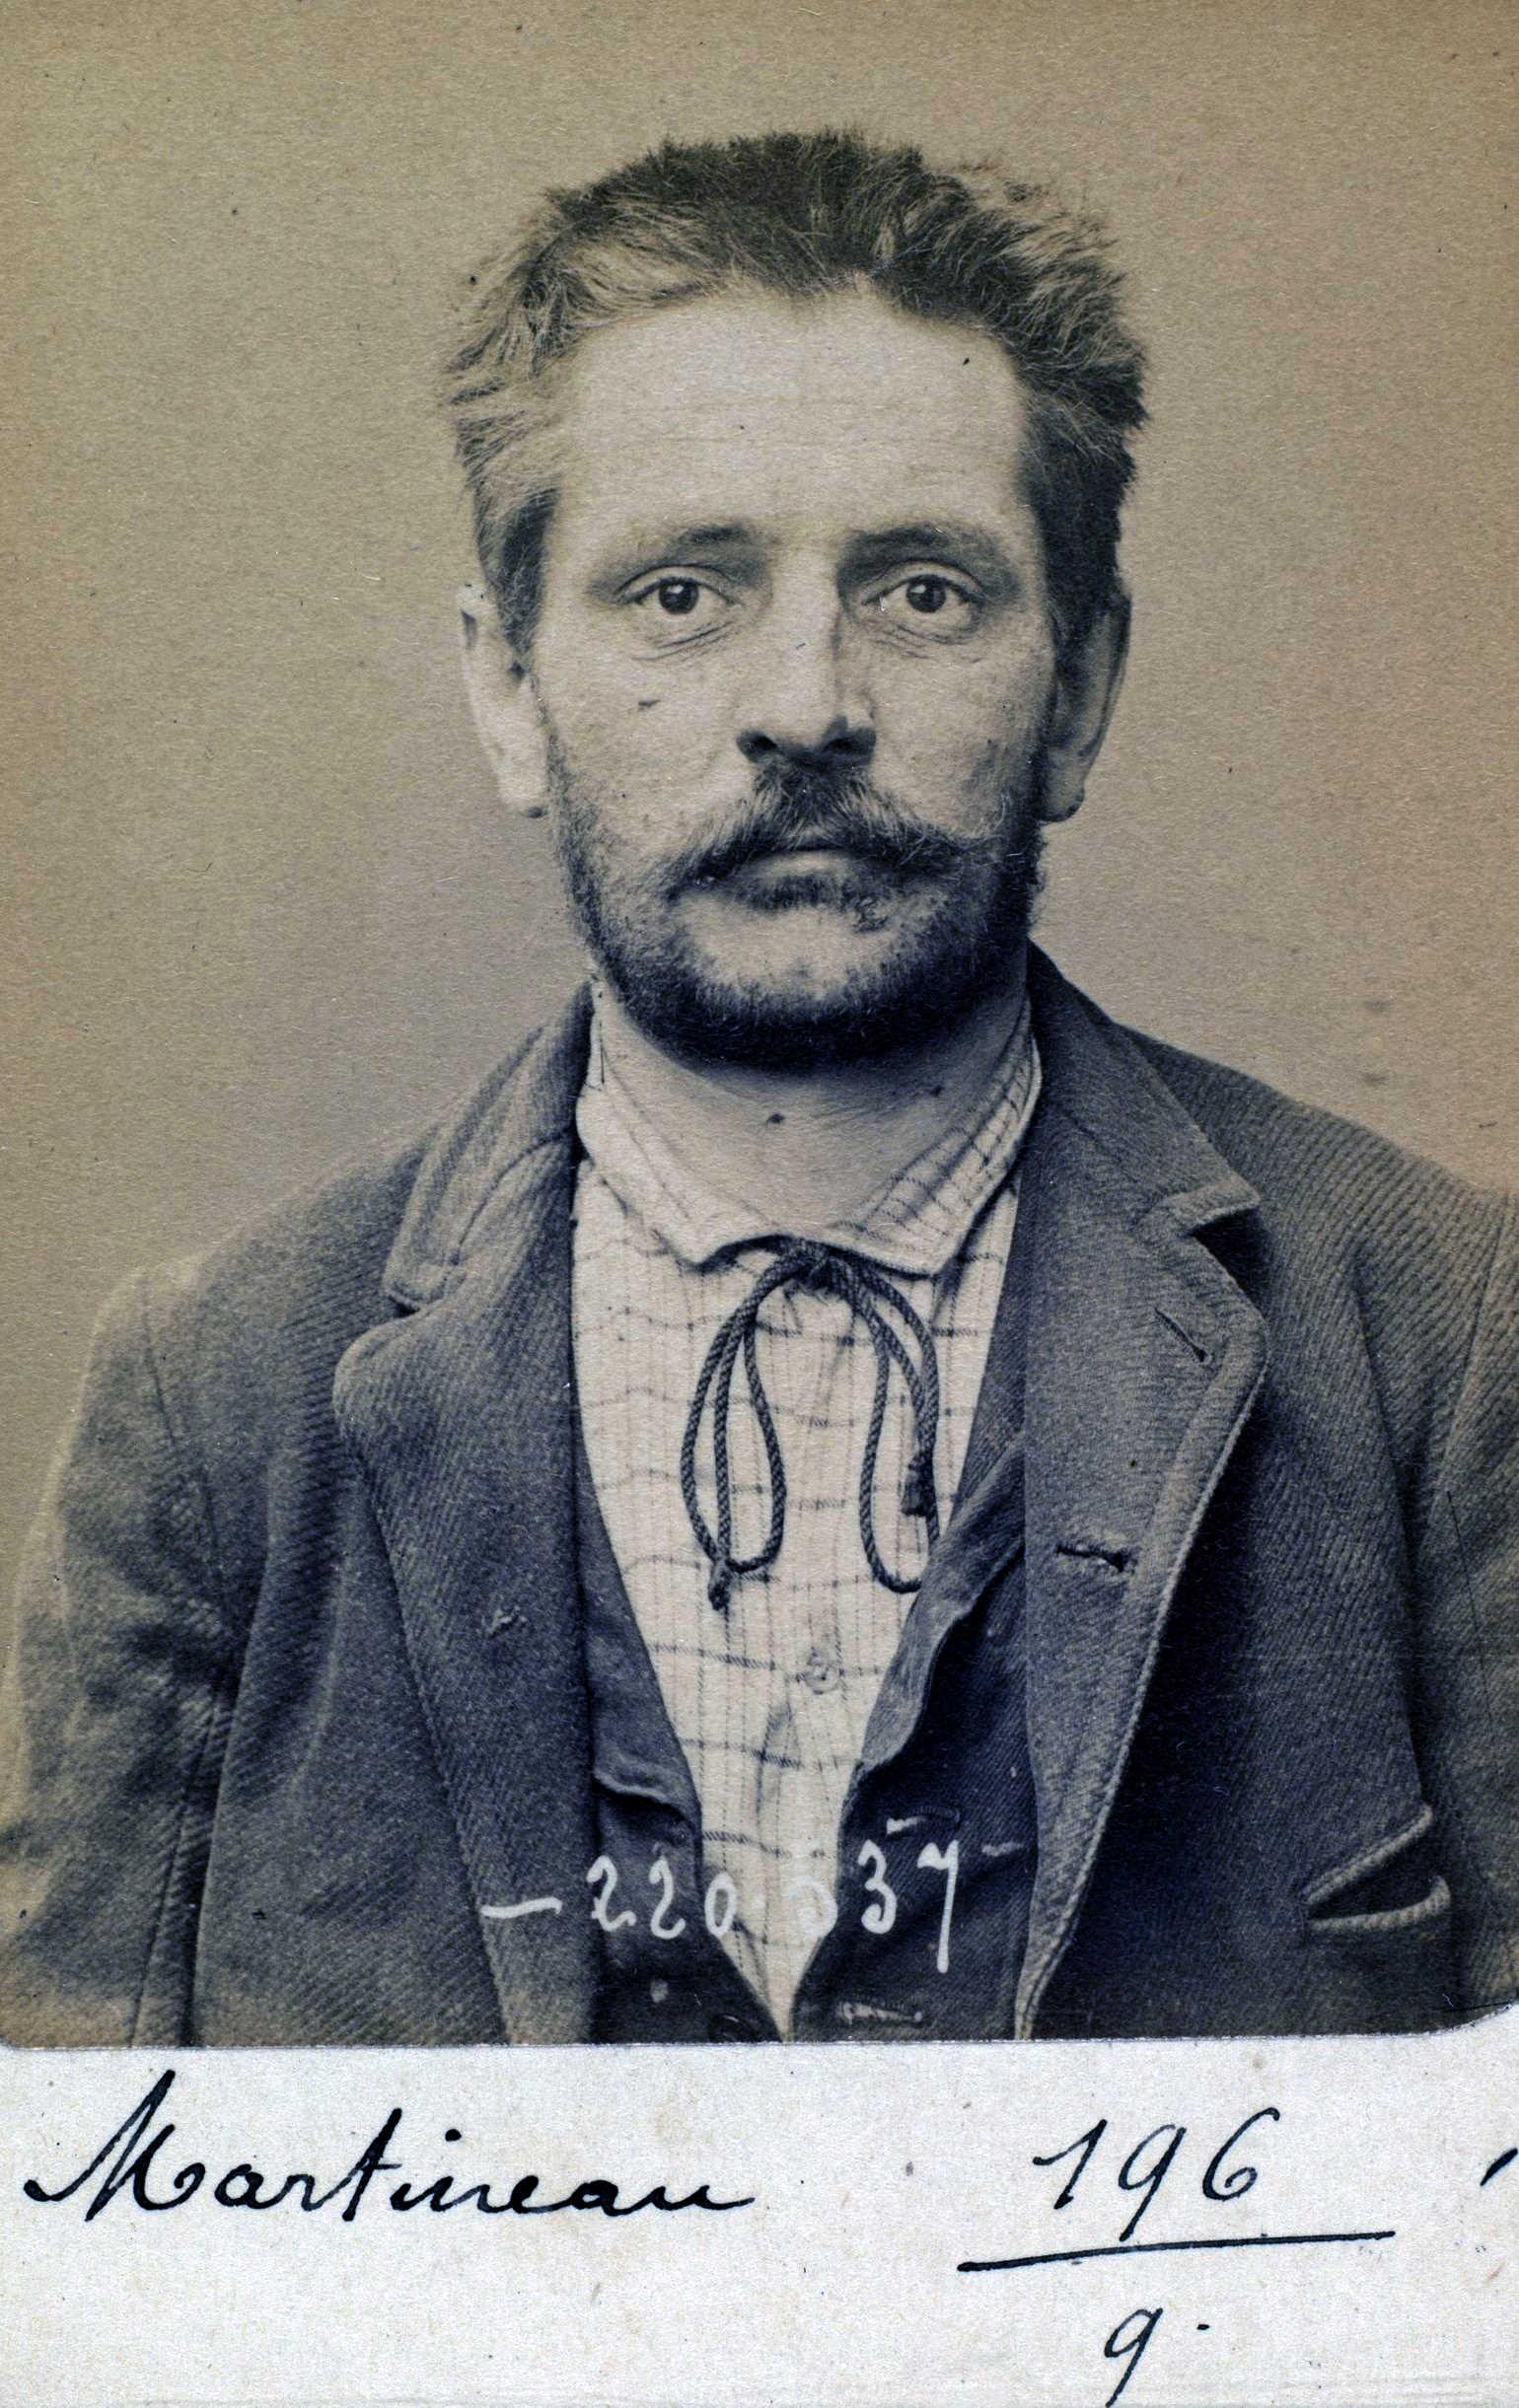 Foto policíaca de Jules Martineau (3 de juliol de 1894)